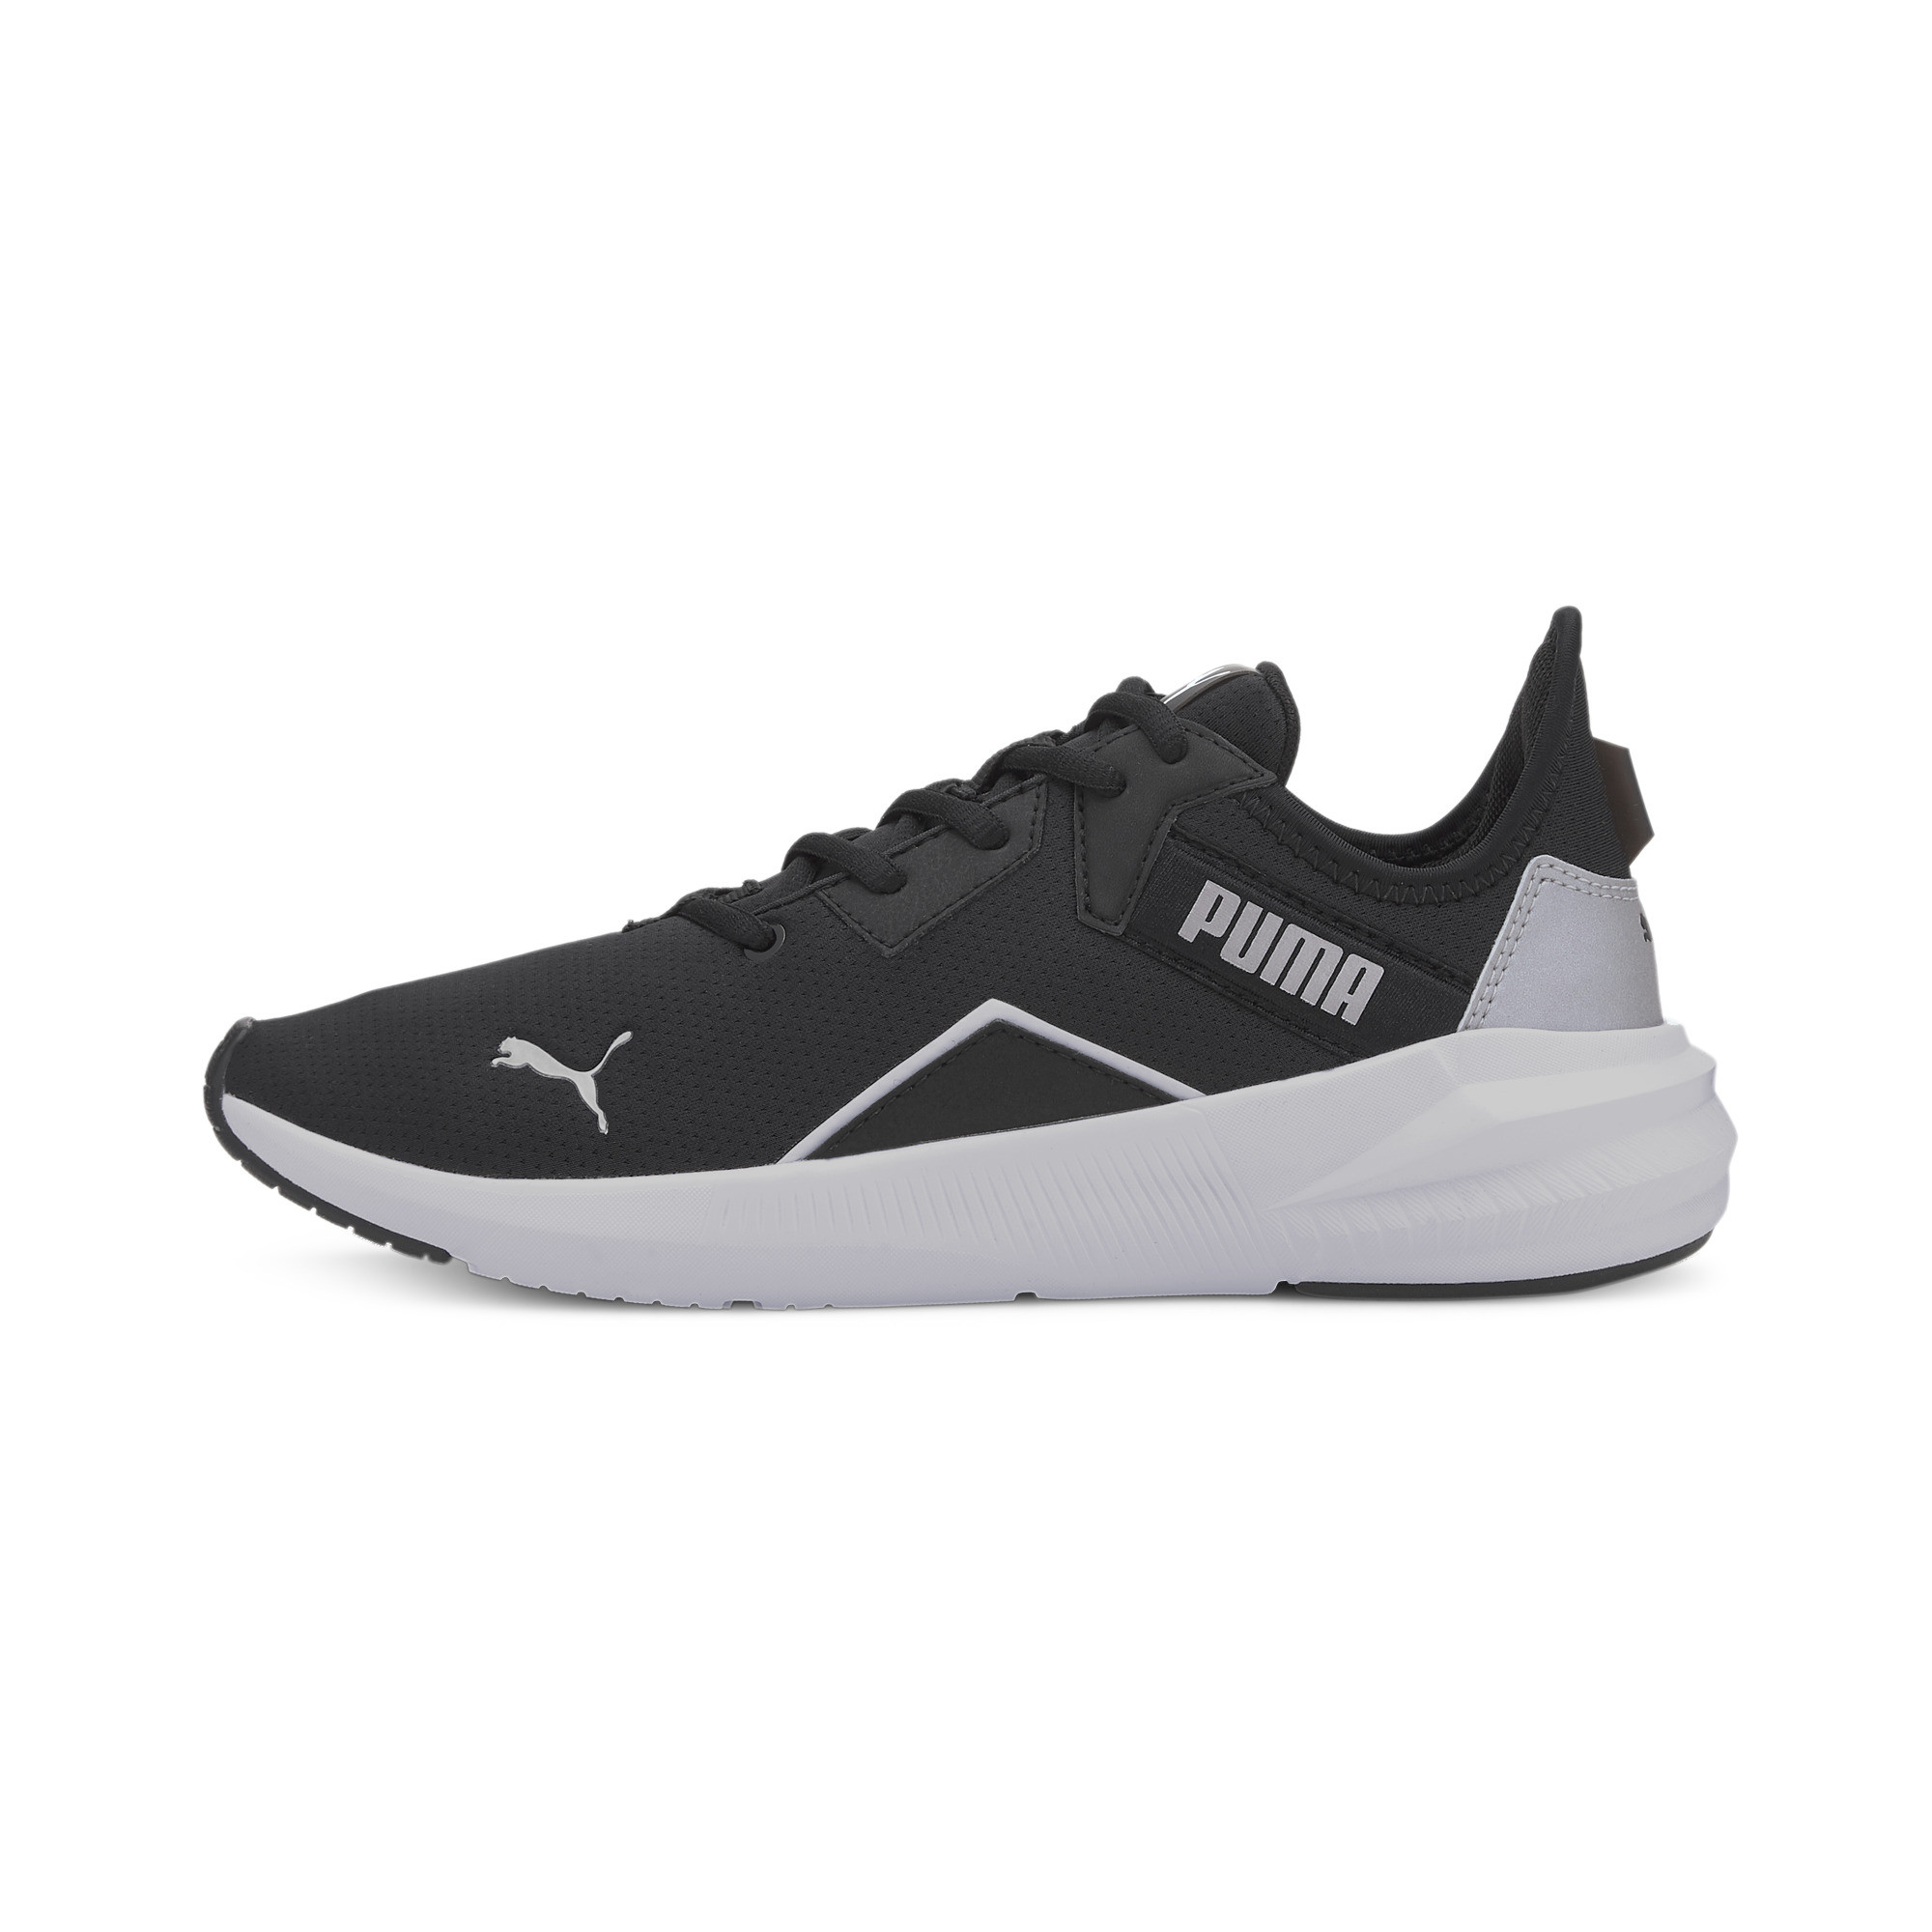 thumbnail 18 - PUMA-Women-039-s-Platinum-Training-Shoes